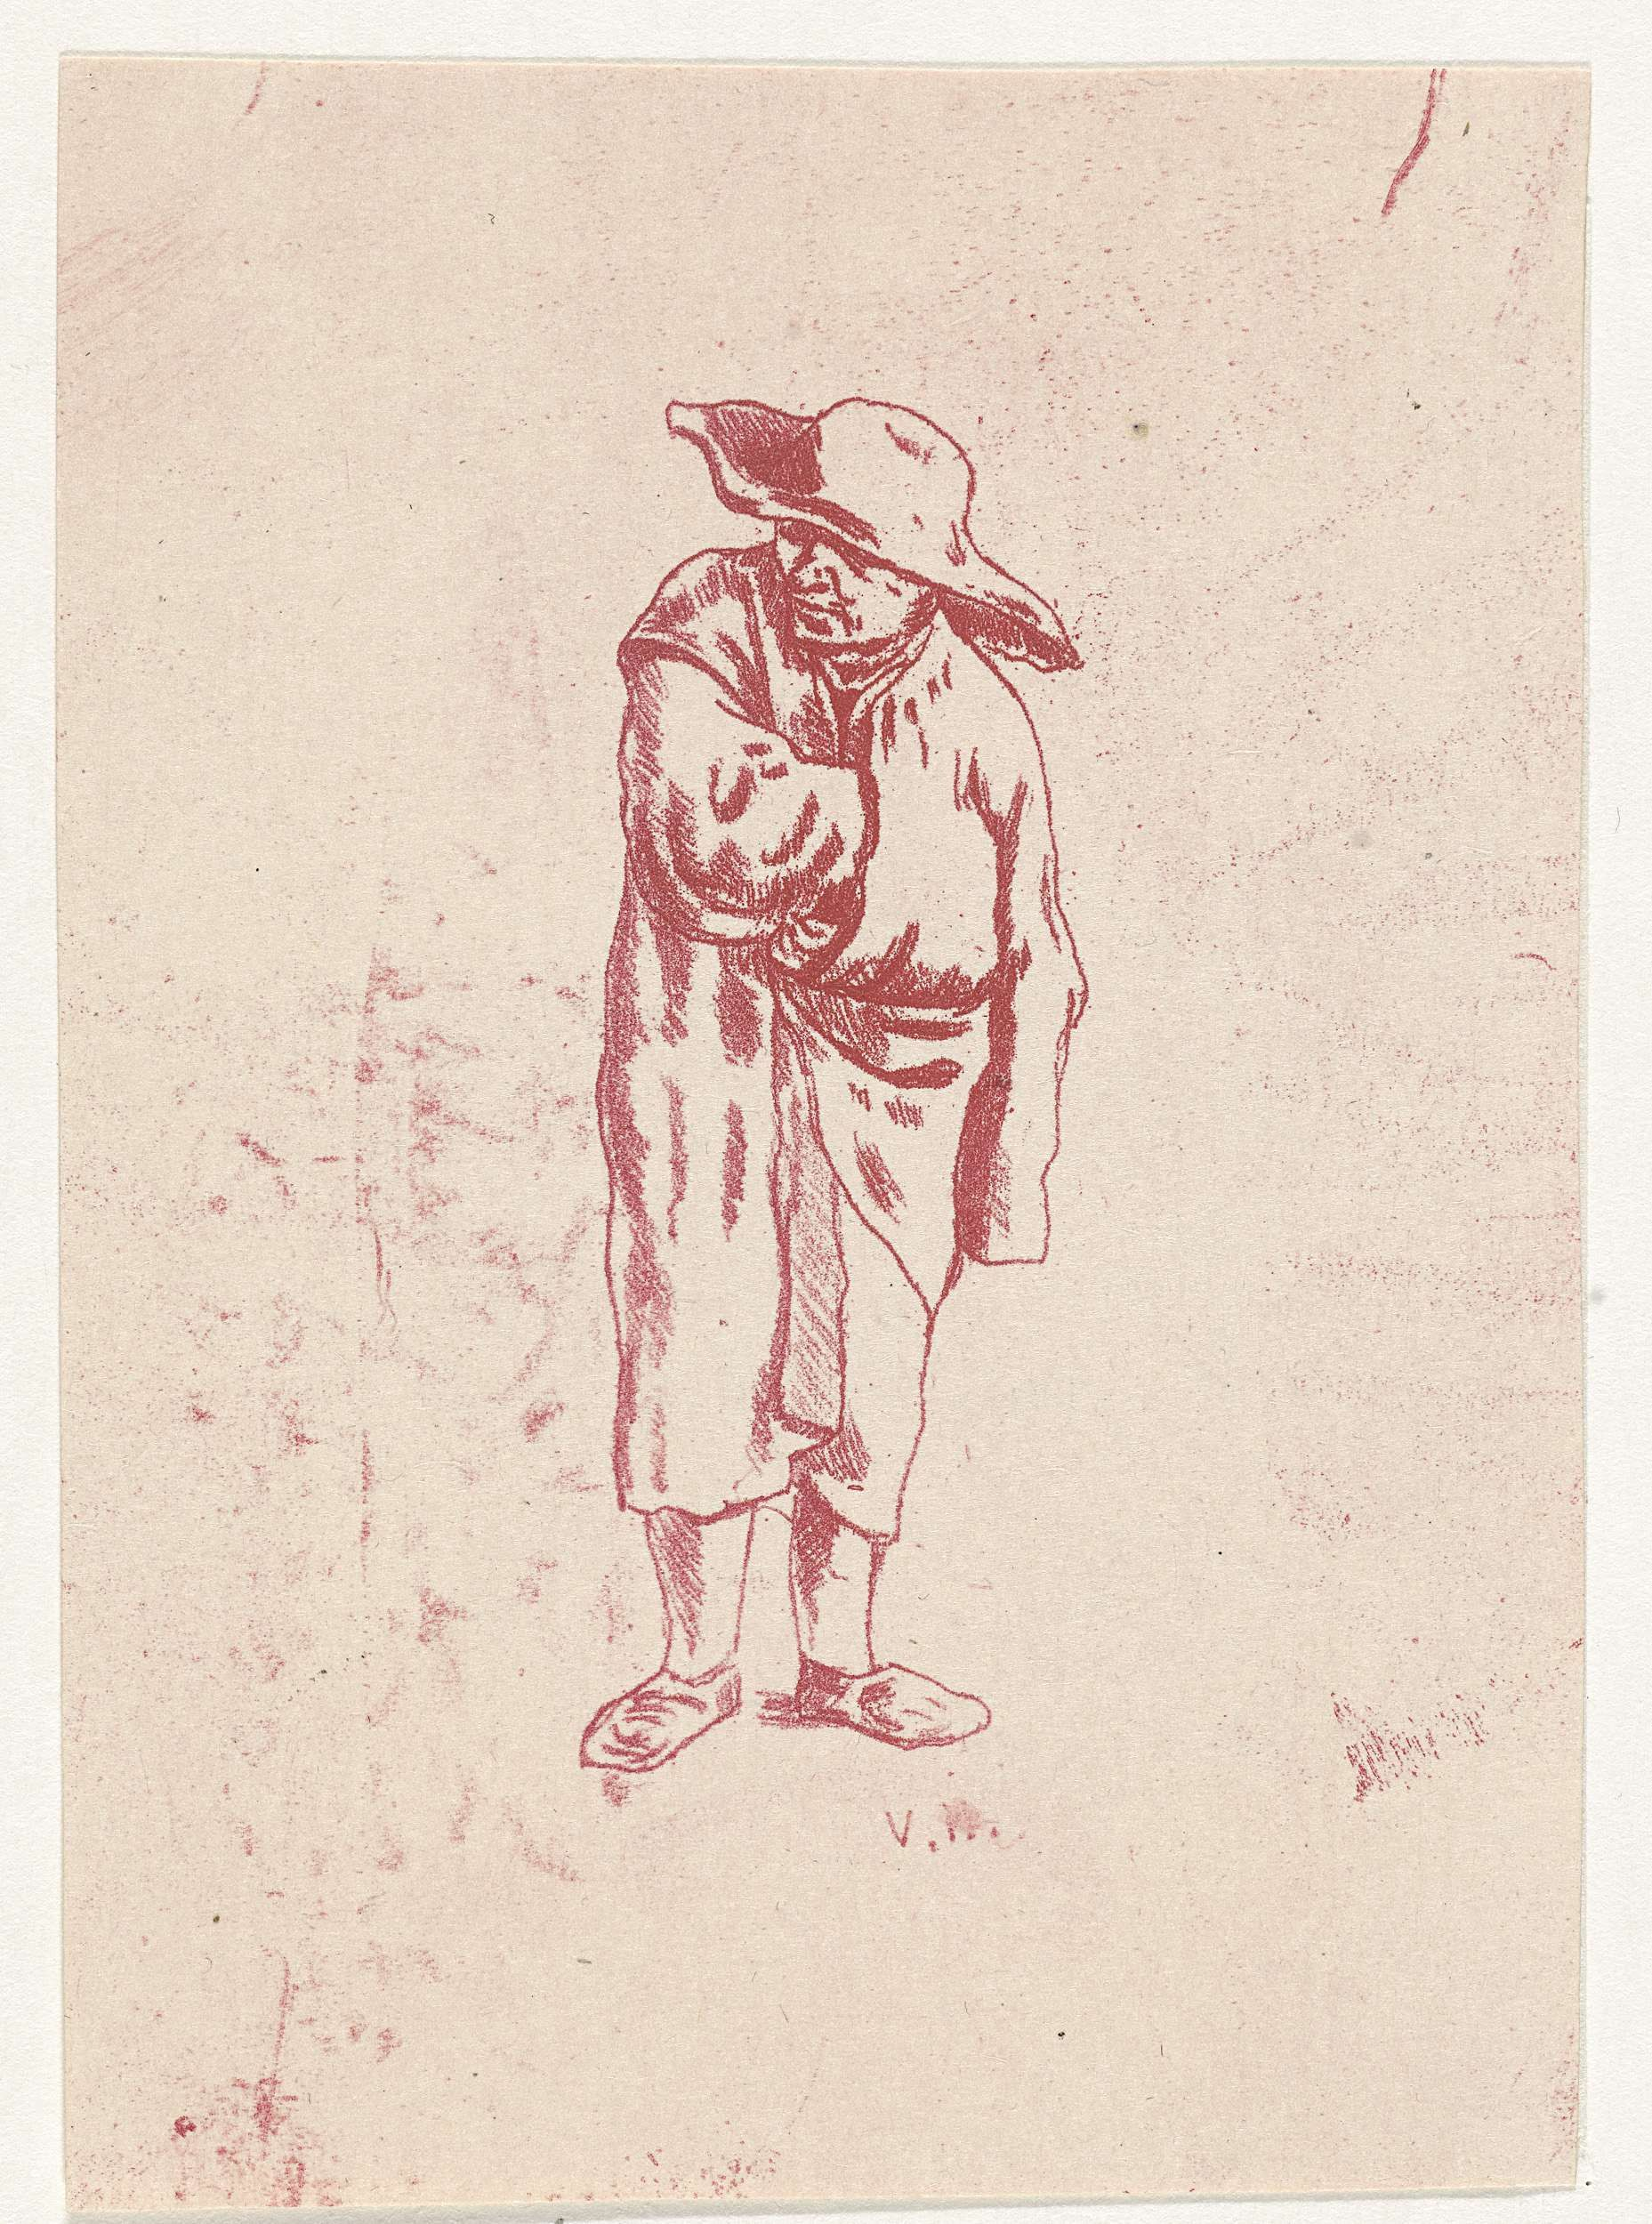 Nicolaas Gerhard van Huffel | Man met arm in zijn jas gestoken, Nicolaas Gerhard van Huffel, 1910 | Staande man met rechterarm in zijn jas gestoken. Hij draagt een hoed.